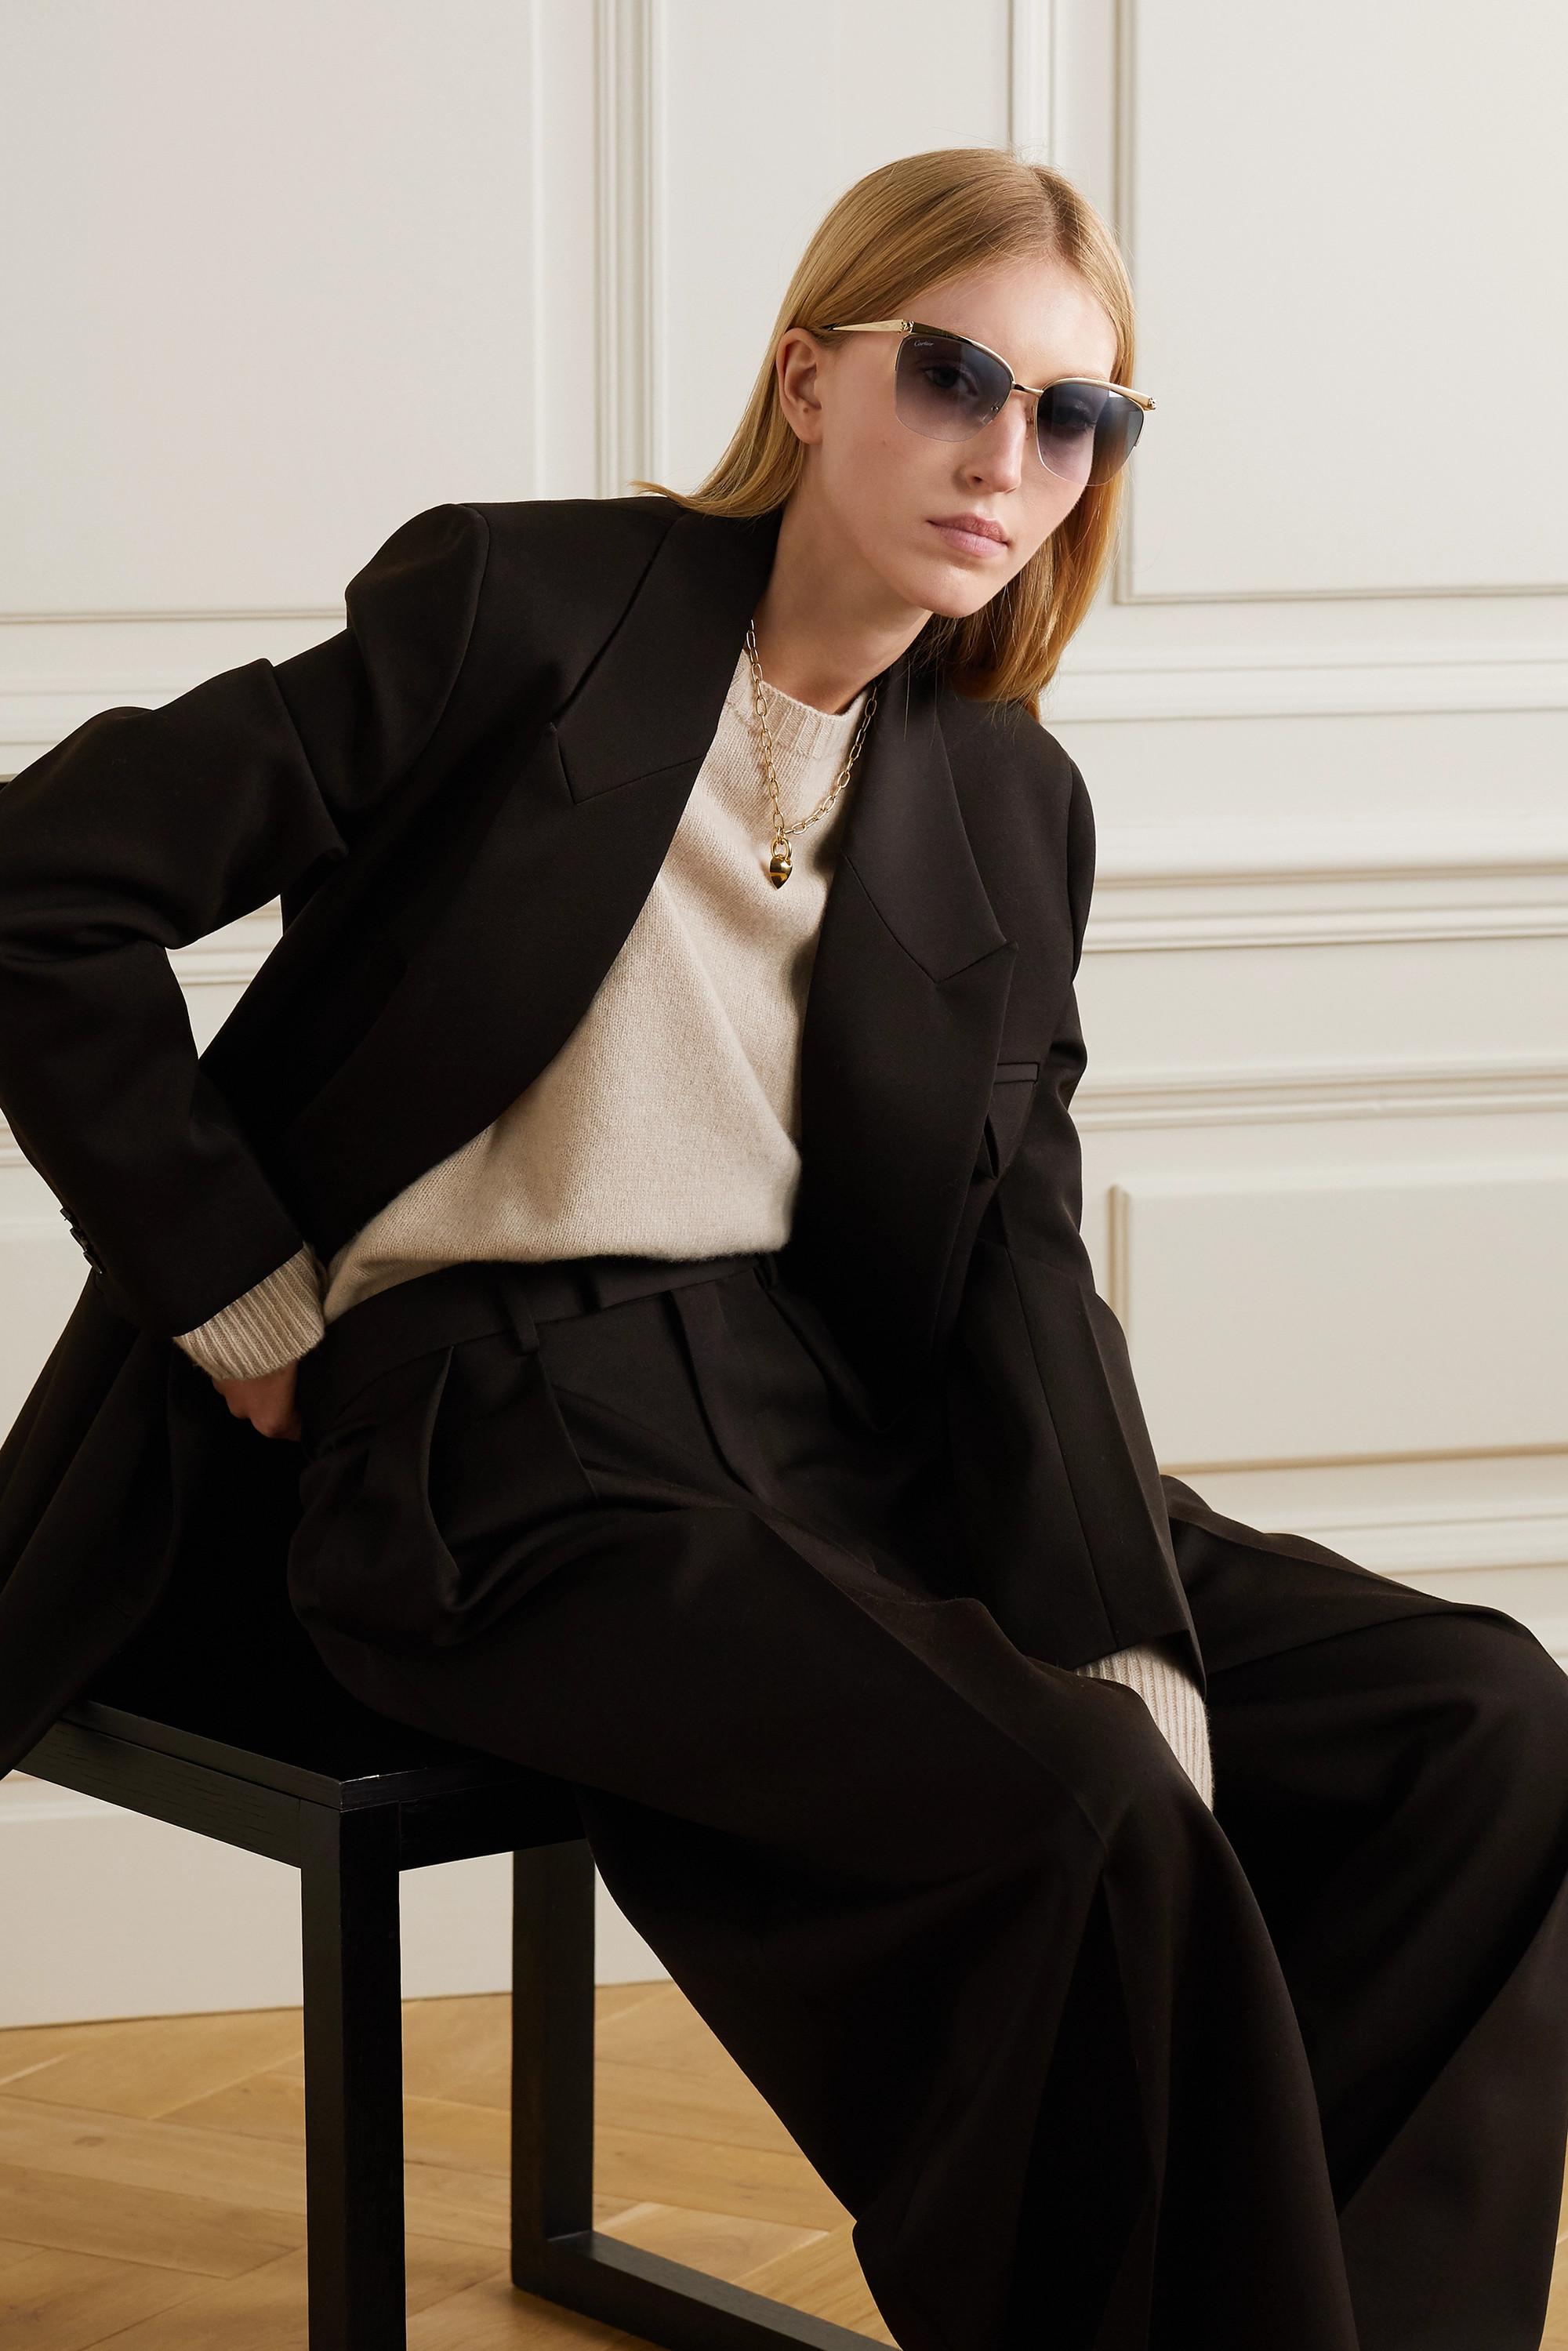 Cartier Eyewear Goldfarbene Sonnenbrille mit Cat-Eye-Rahmen